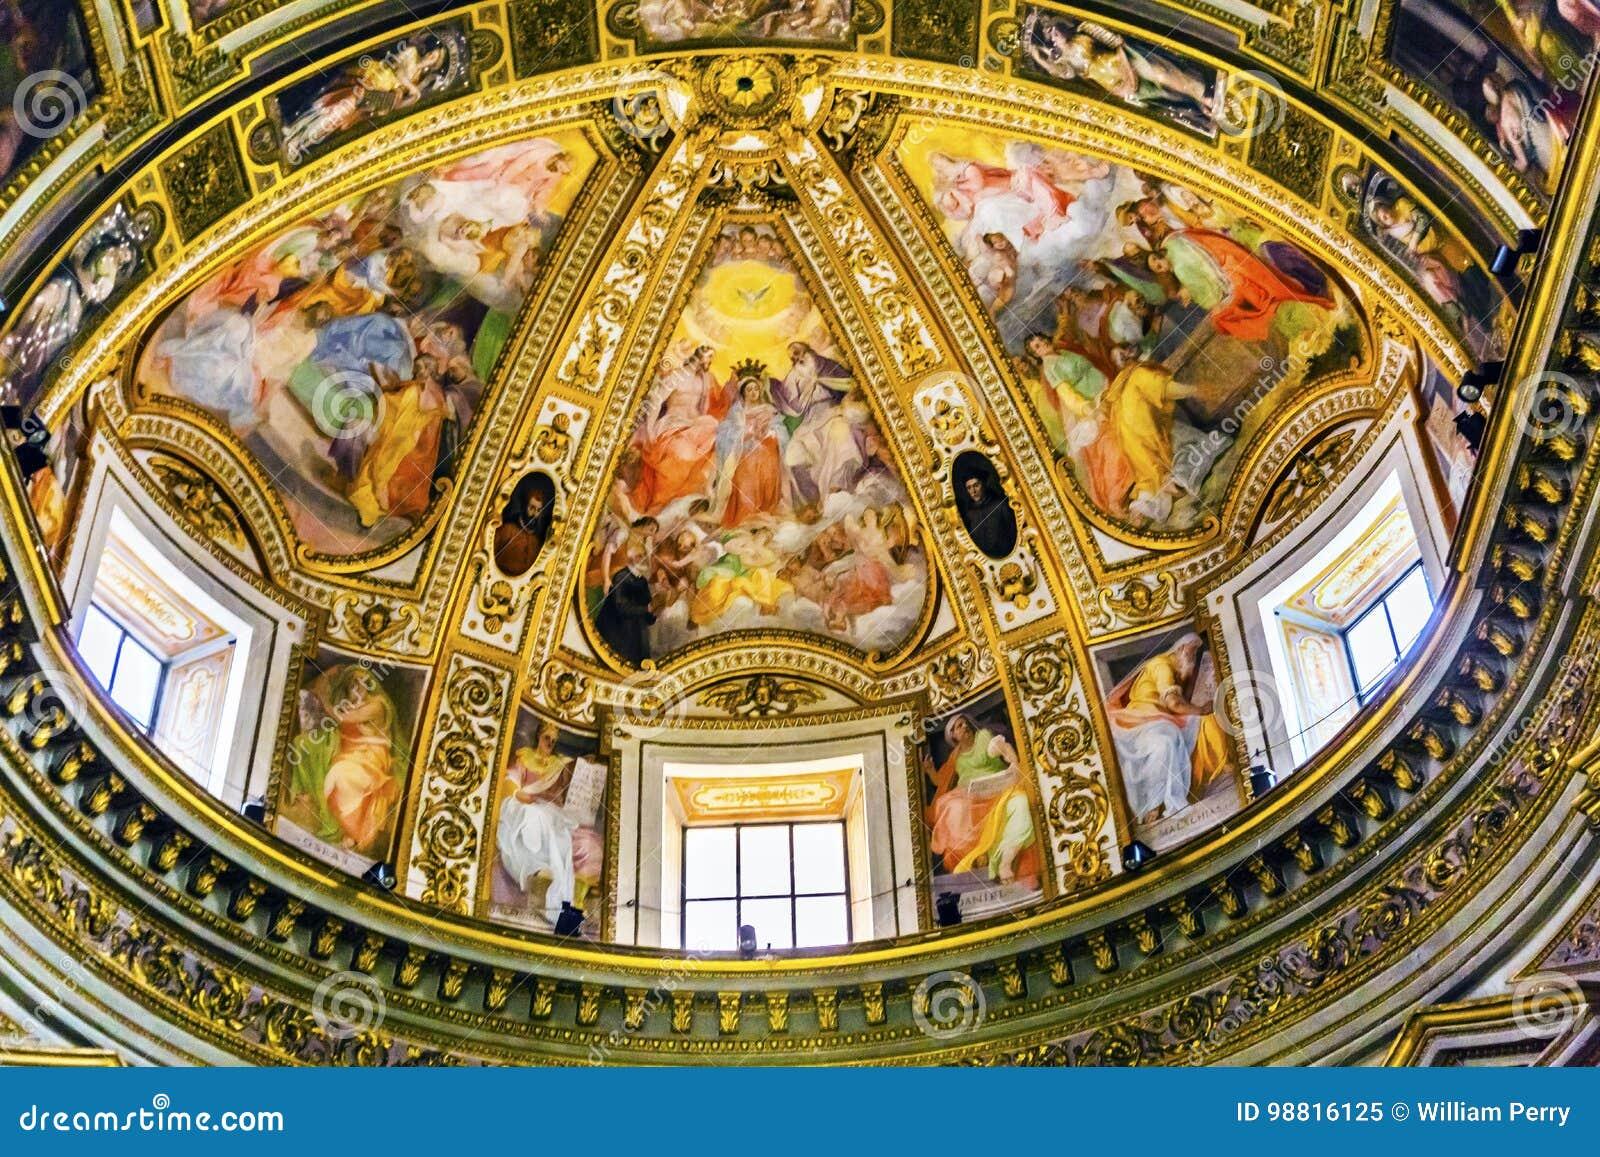 Hauben-Freskos Chiesa San Marcello al Corso Church Rome Italy